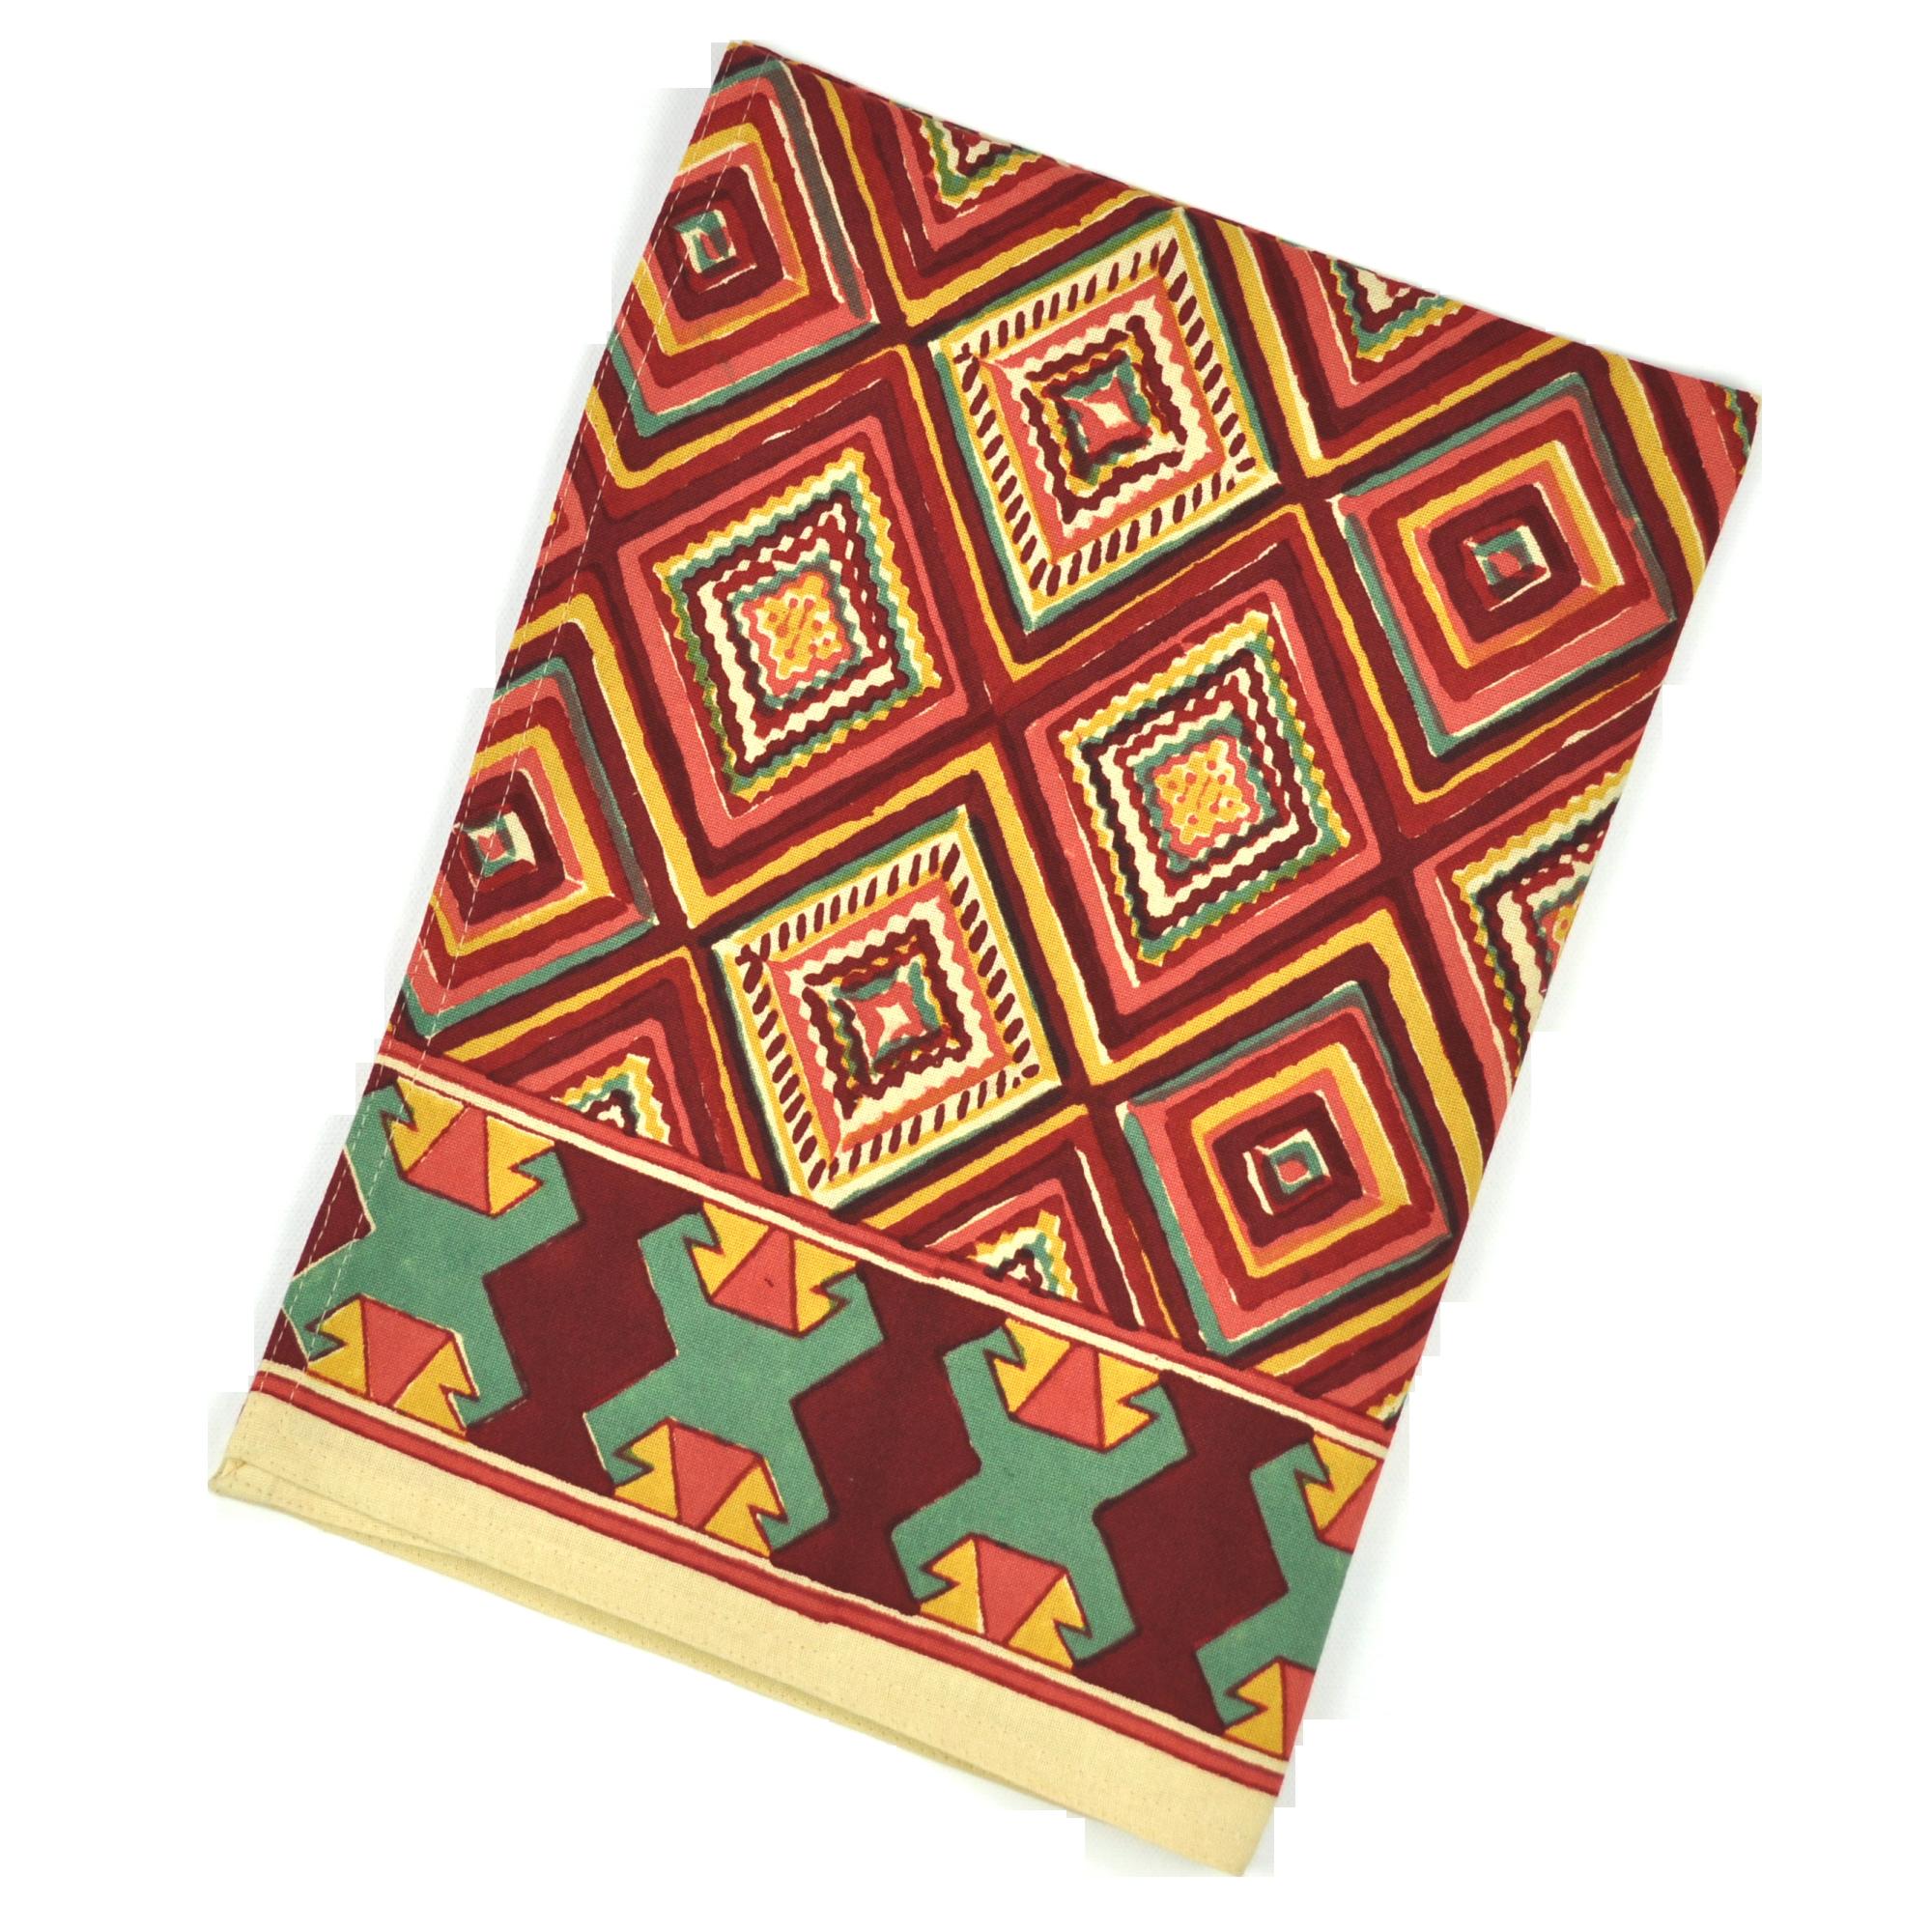 Zig Zag Kitchen: Pacific & Rose Textiles